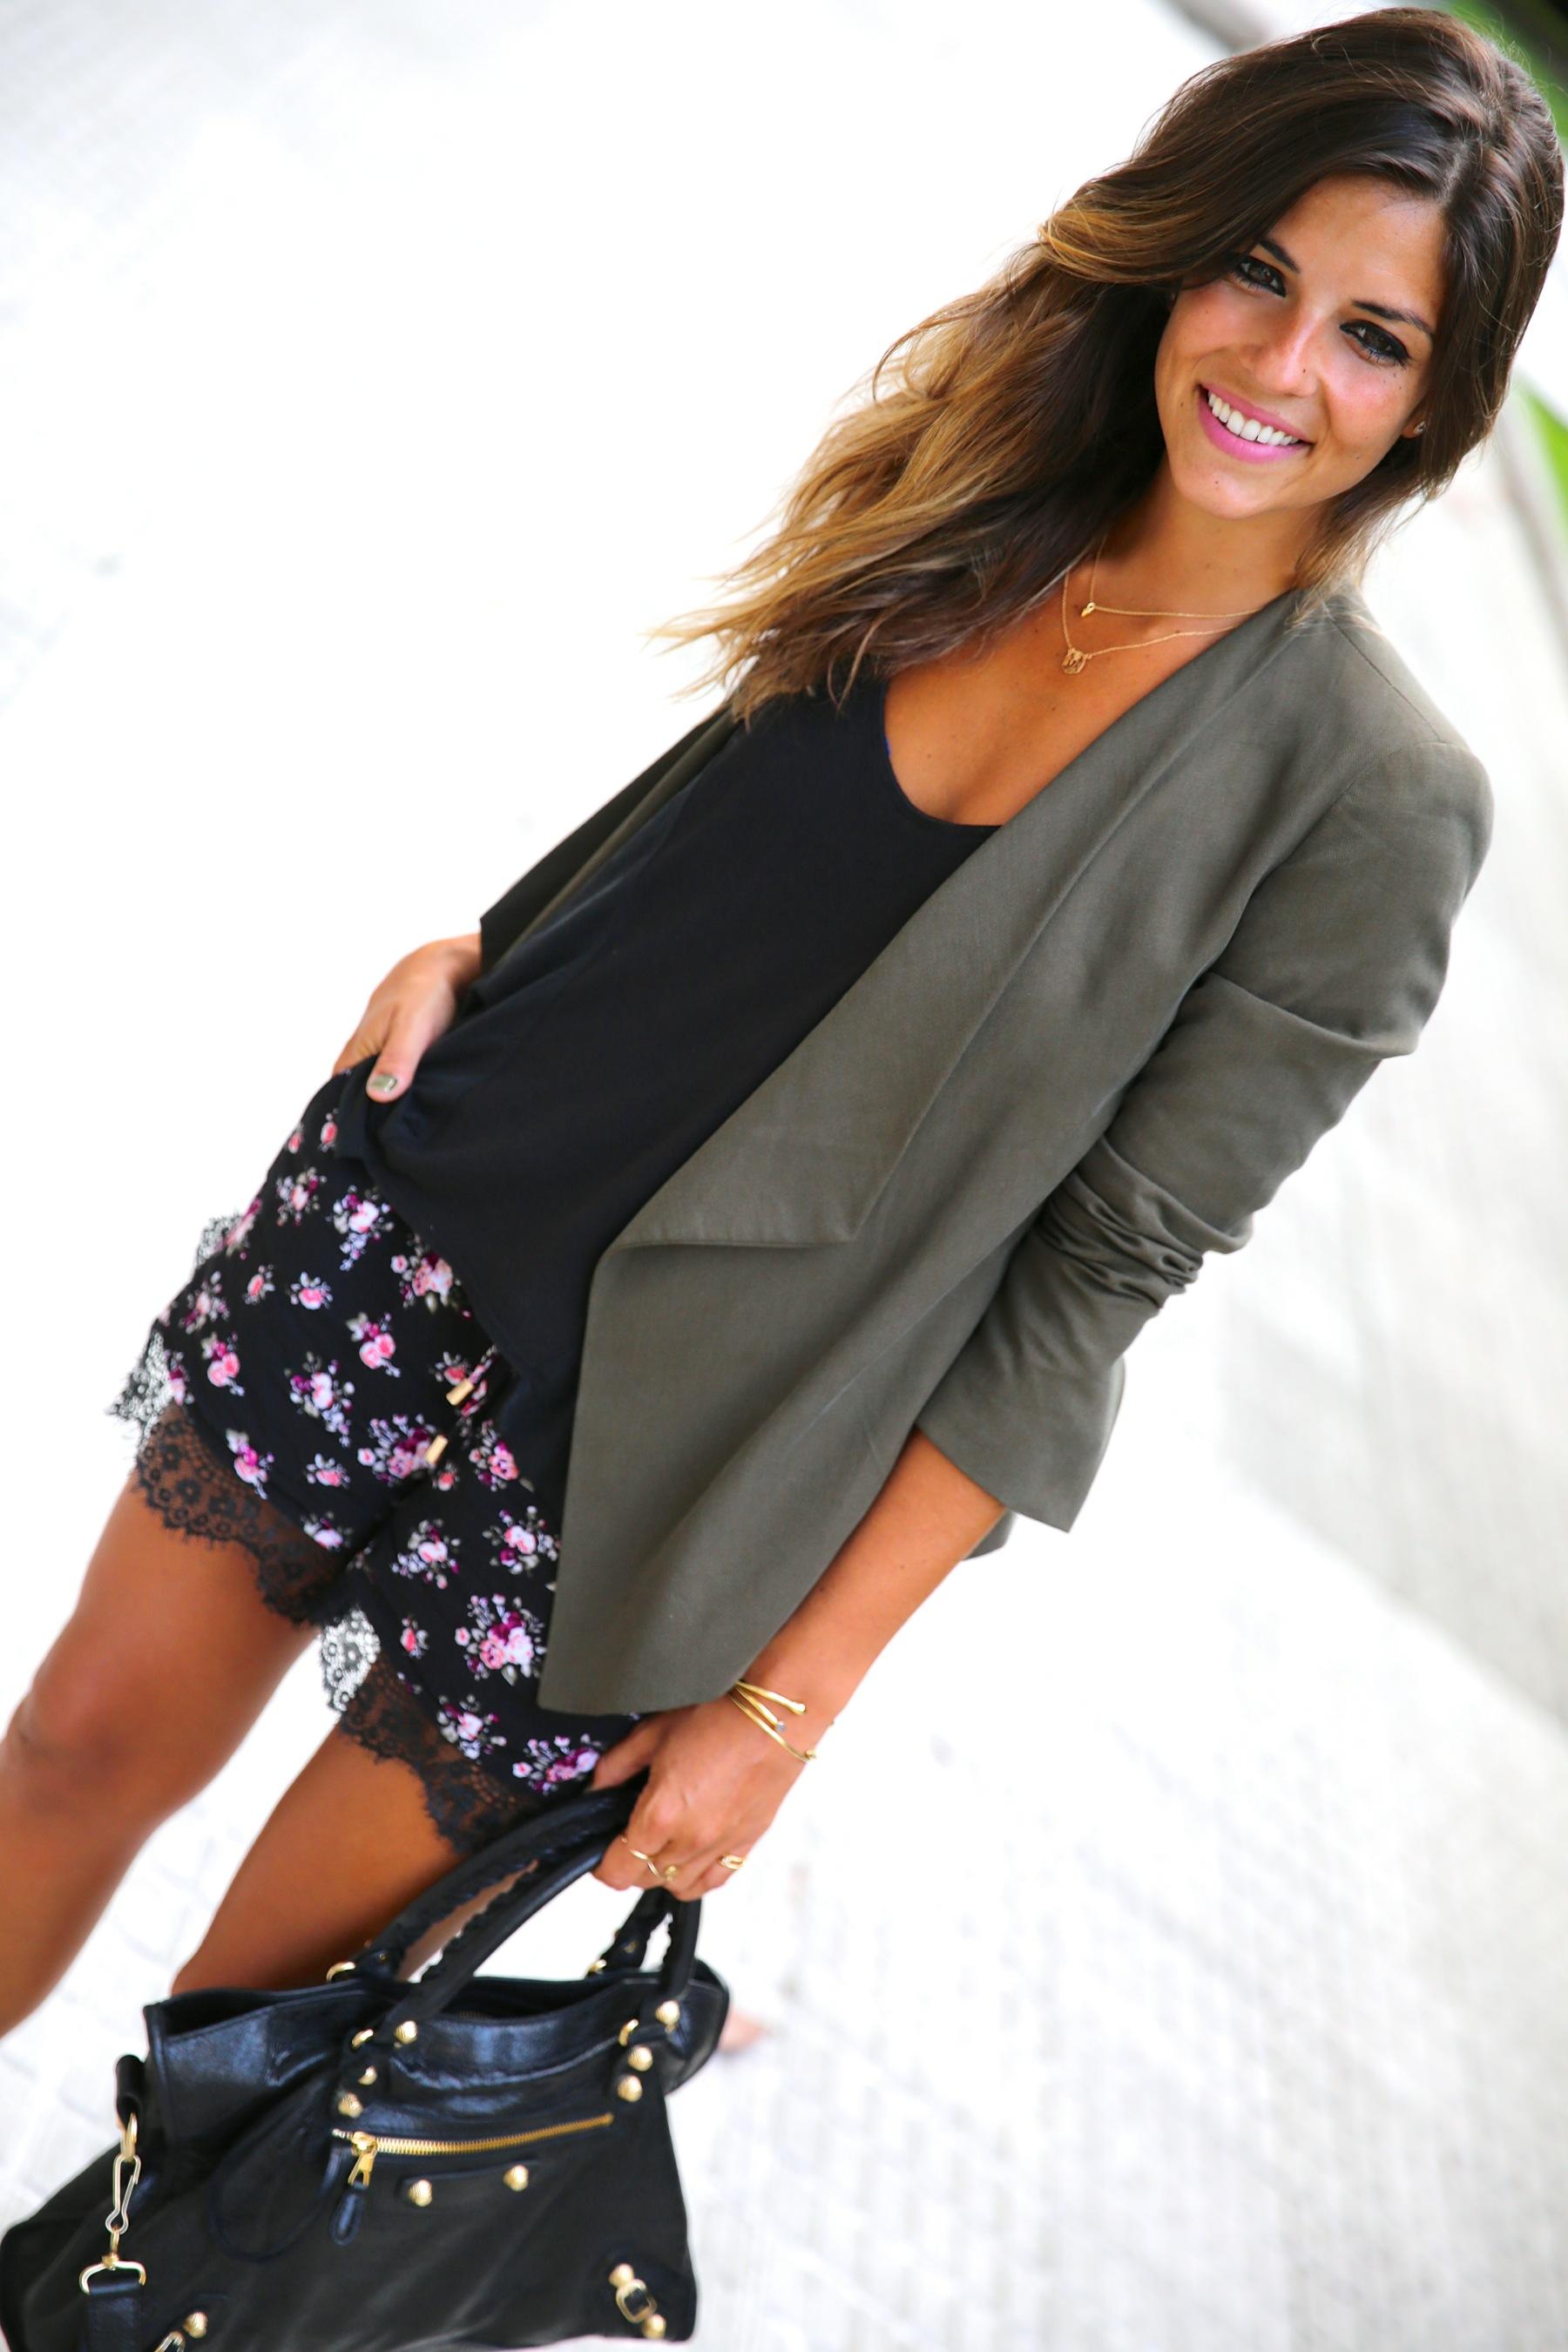 trendy_taste-look-outfit-street_style-ootd-blog-blogger-fashion_spain-moda_españa-khaki_blazer-blazer_caqui-flower_print-estampado_flores-shorts-botines_charol-5